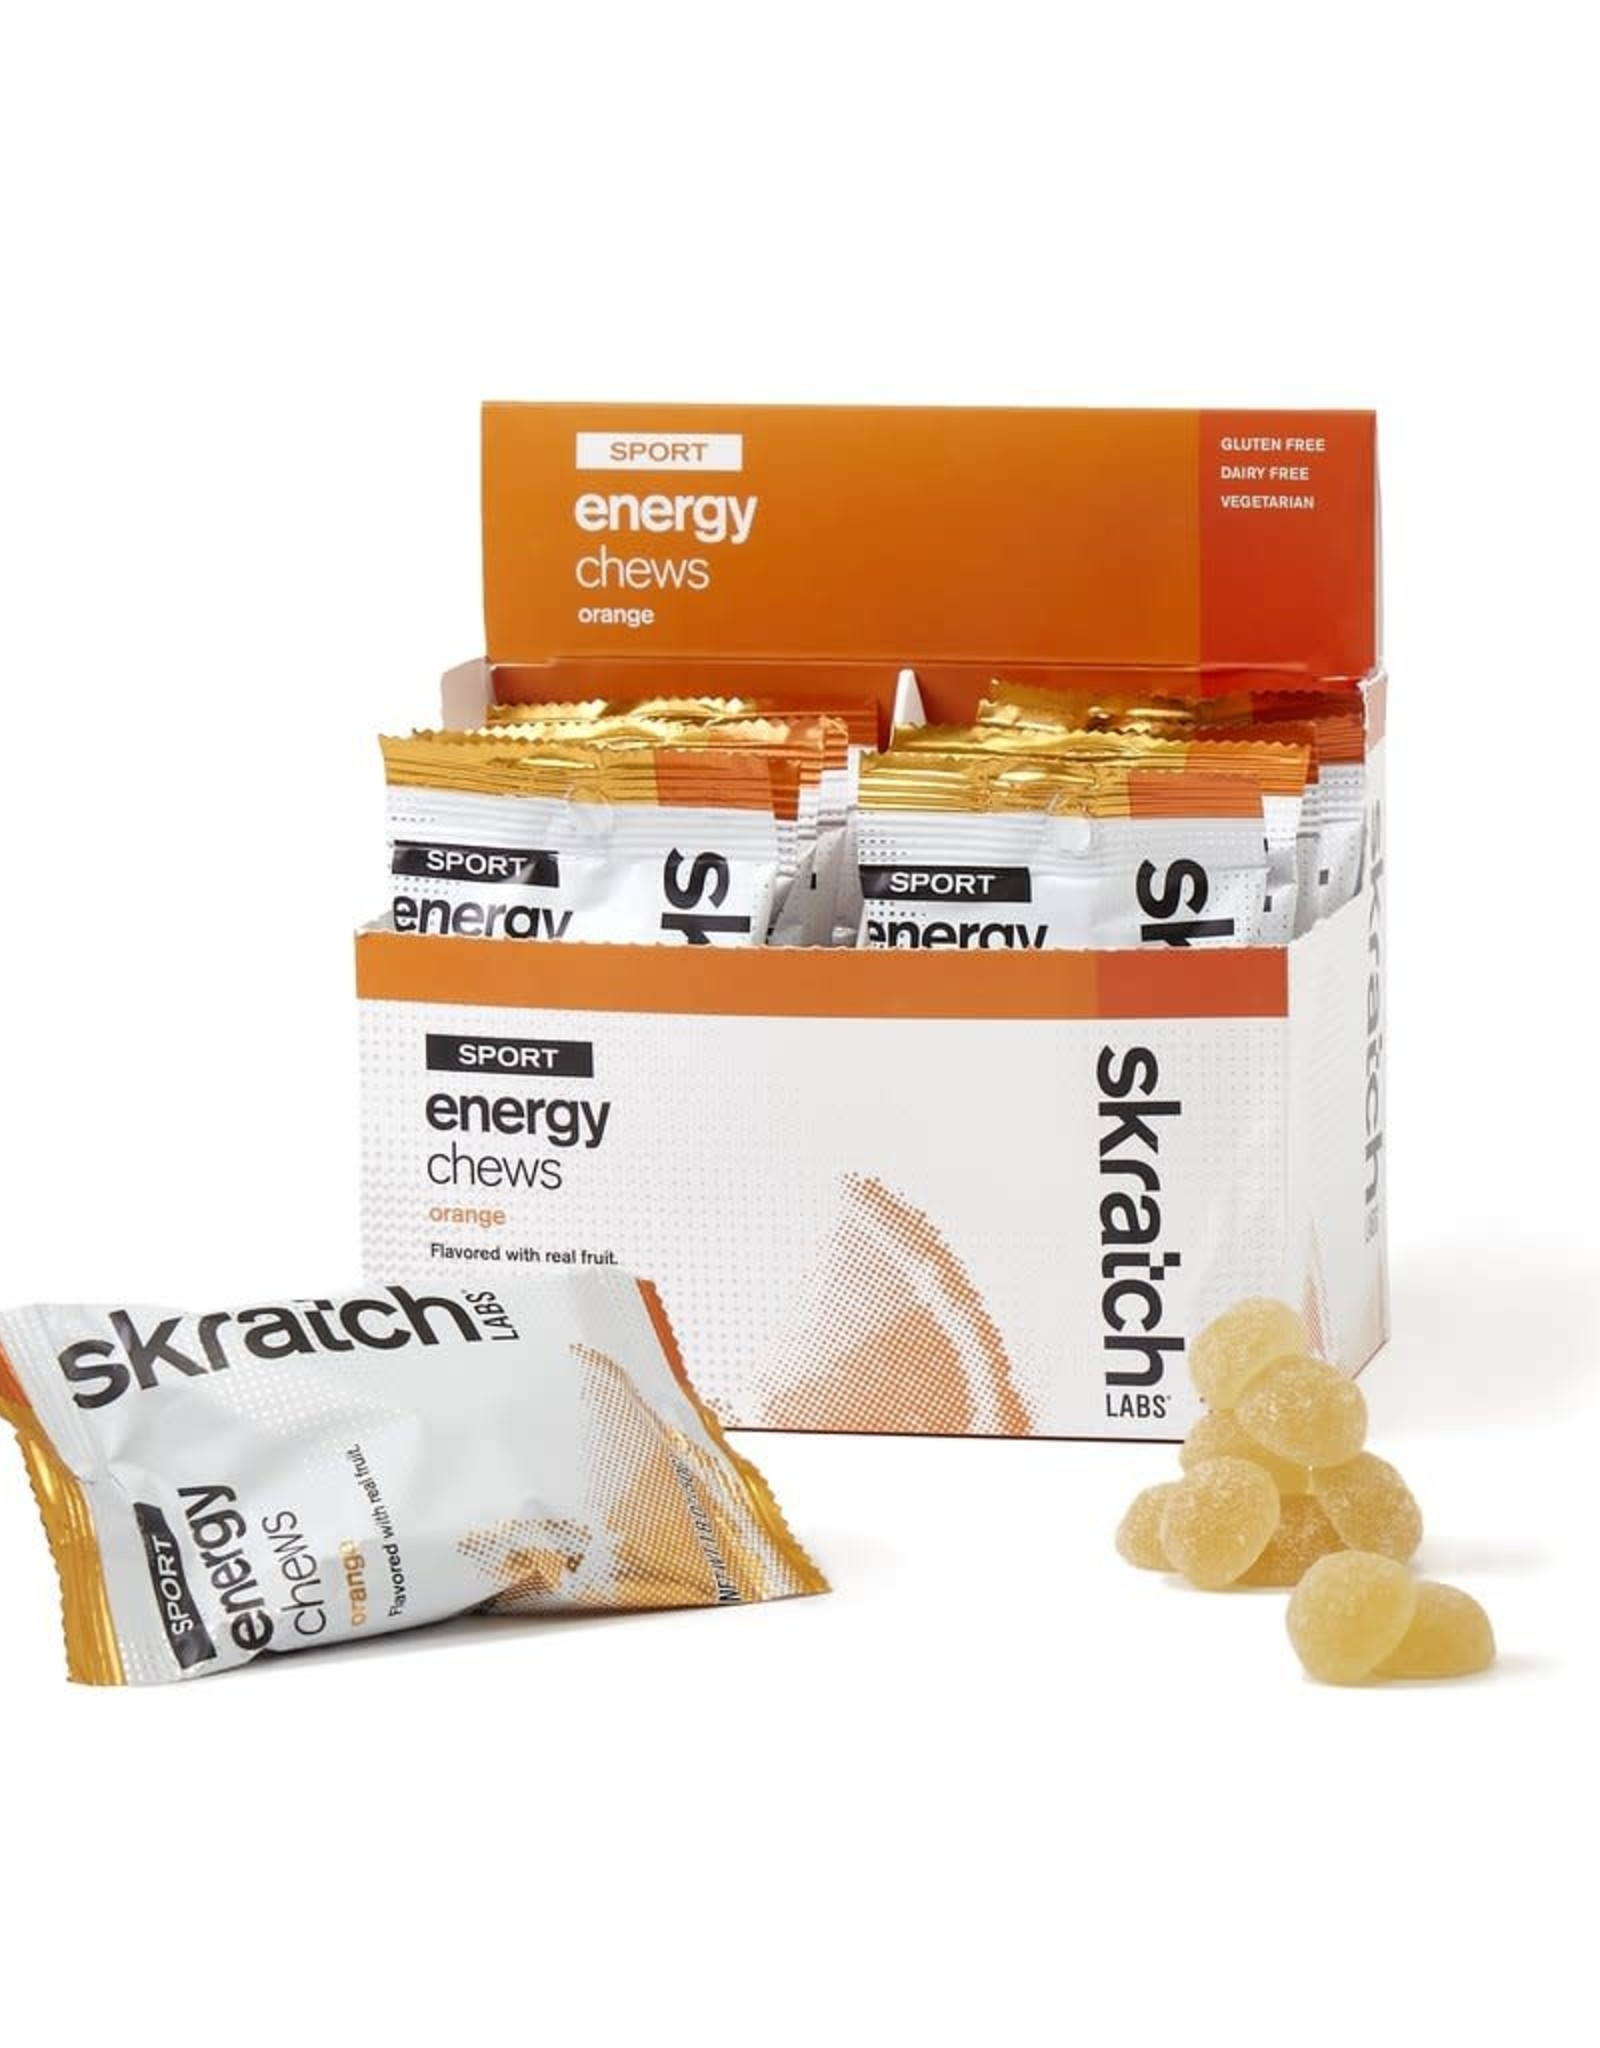 SKRATCH LABS Skratch Labs Sport Energy Chews - Orange / Single Pouch